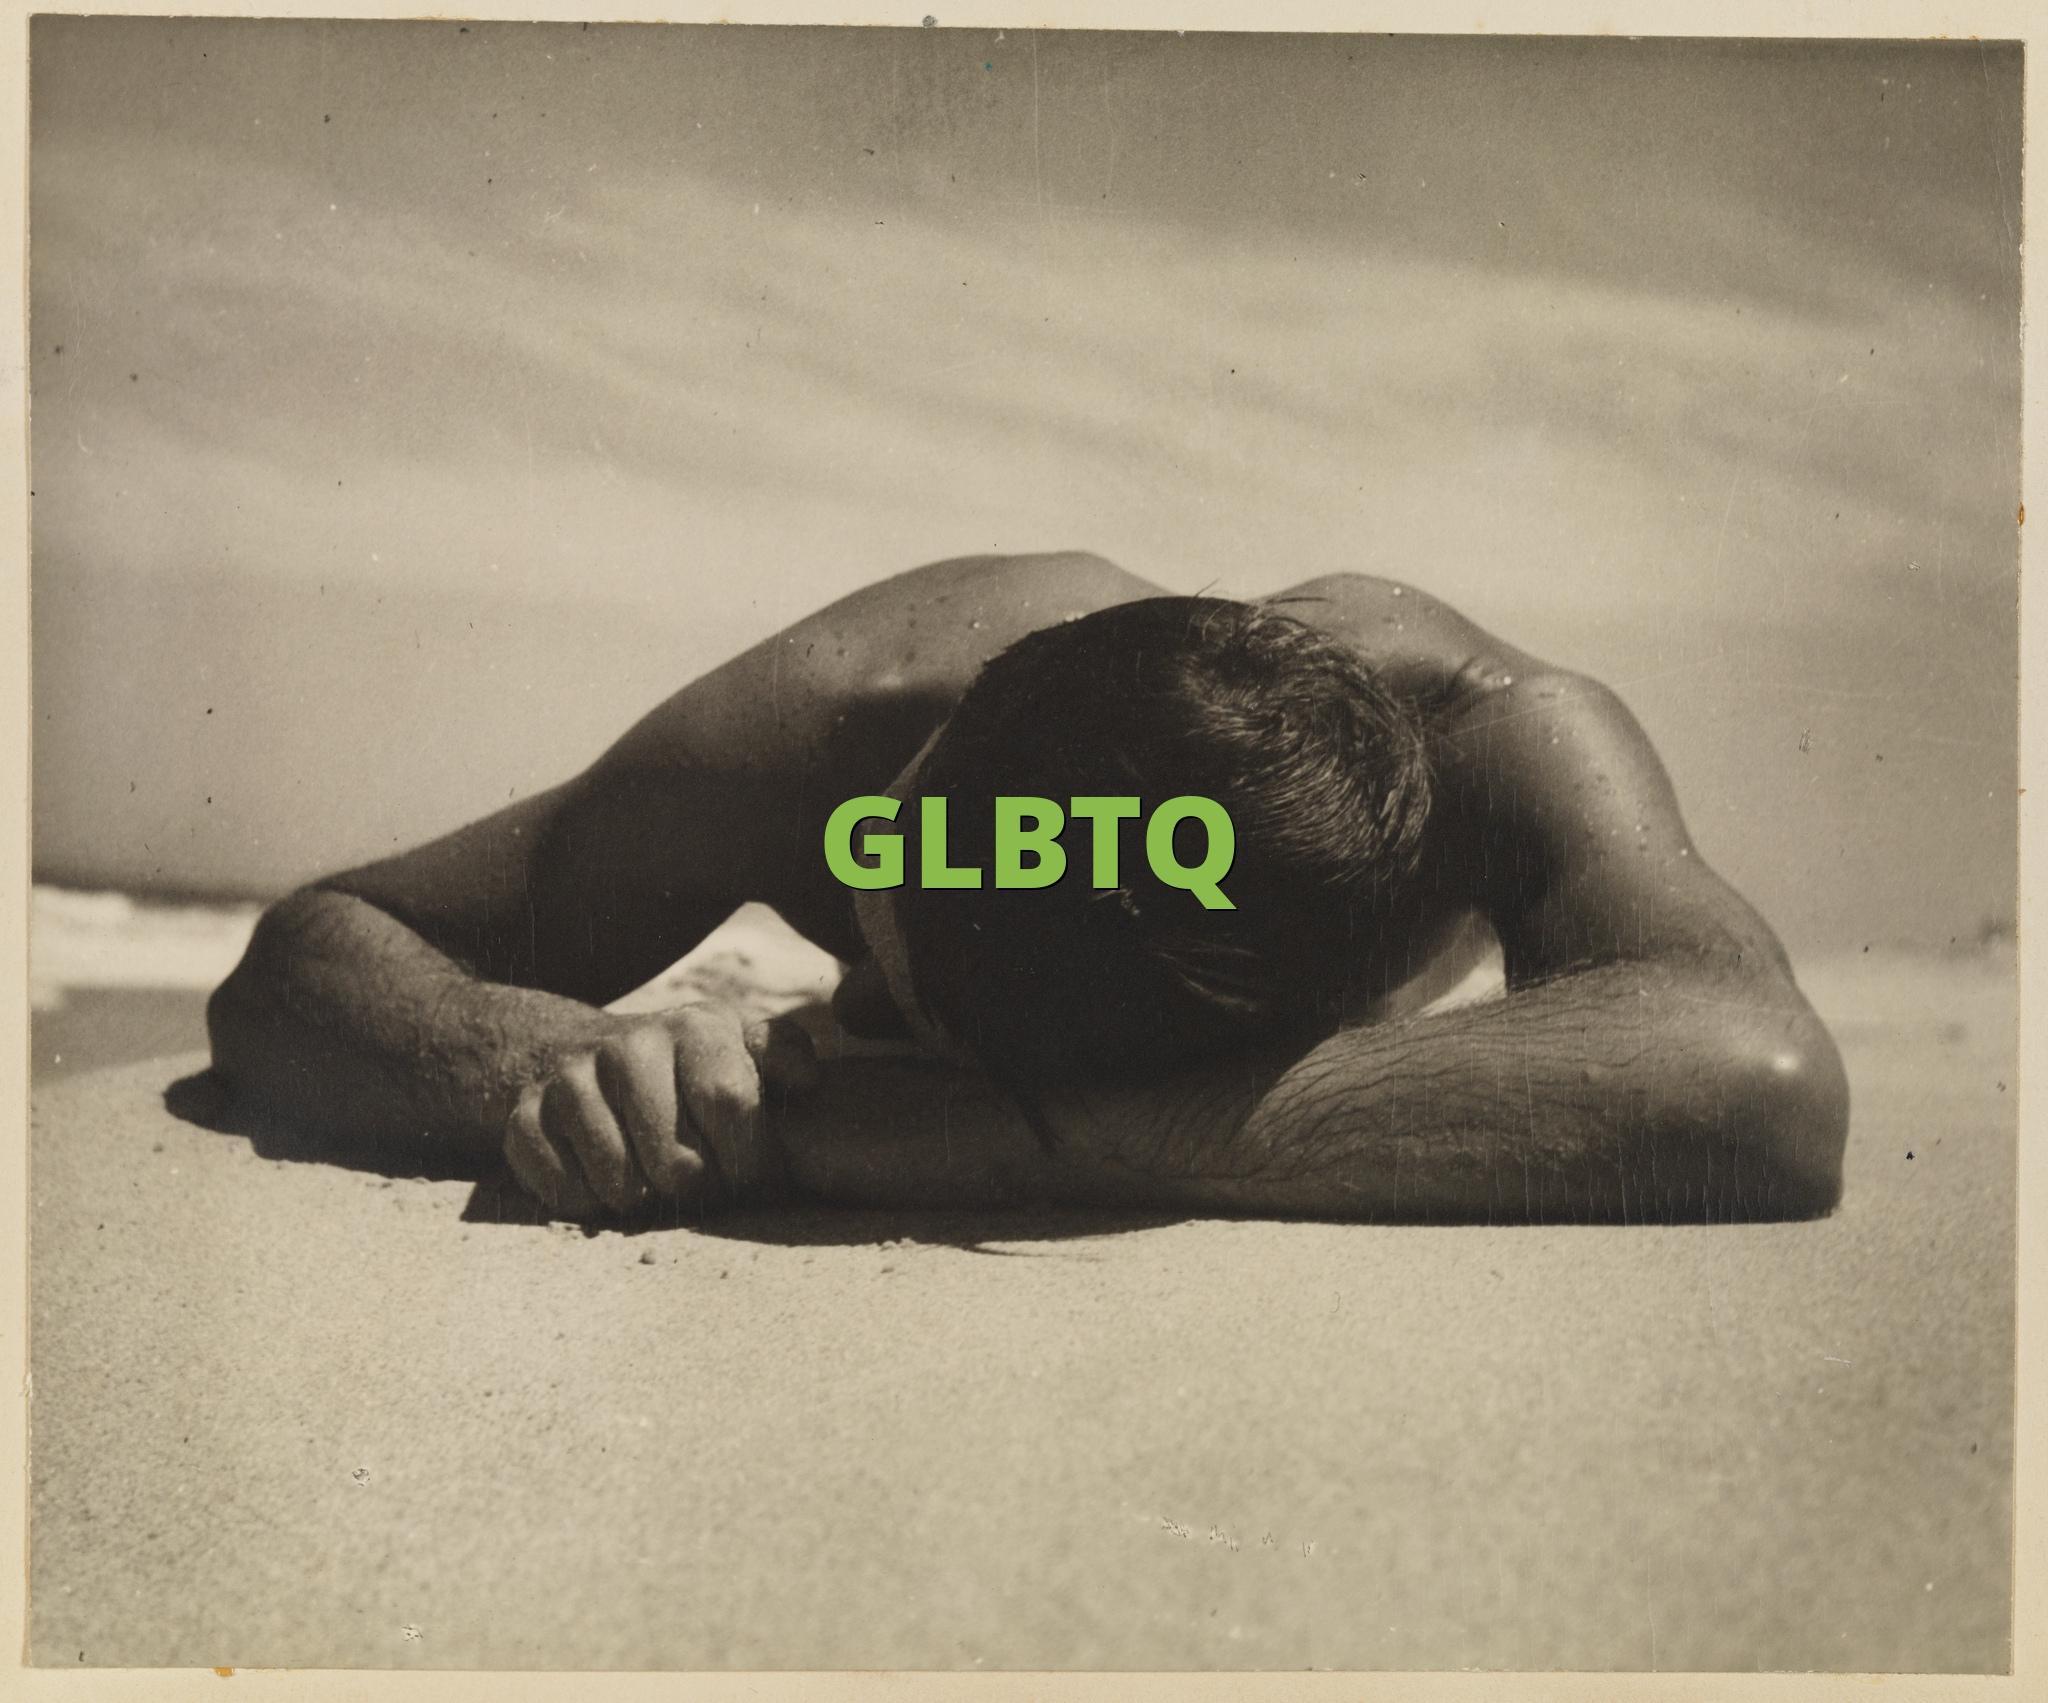 Bisexual Slang 102